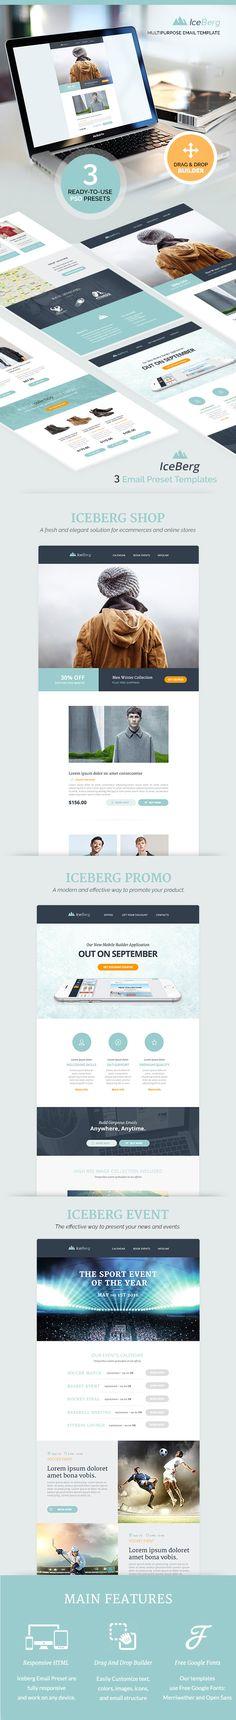 Iceberg - Responsive Email Templates + Builder - Marketing | ThemeForest